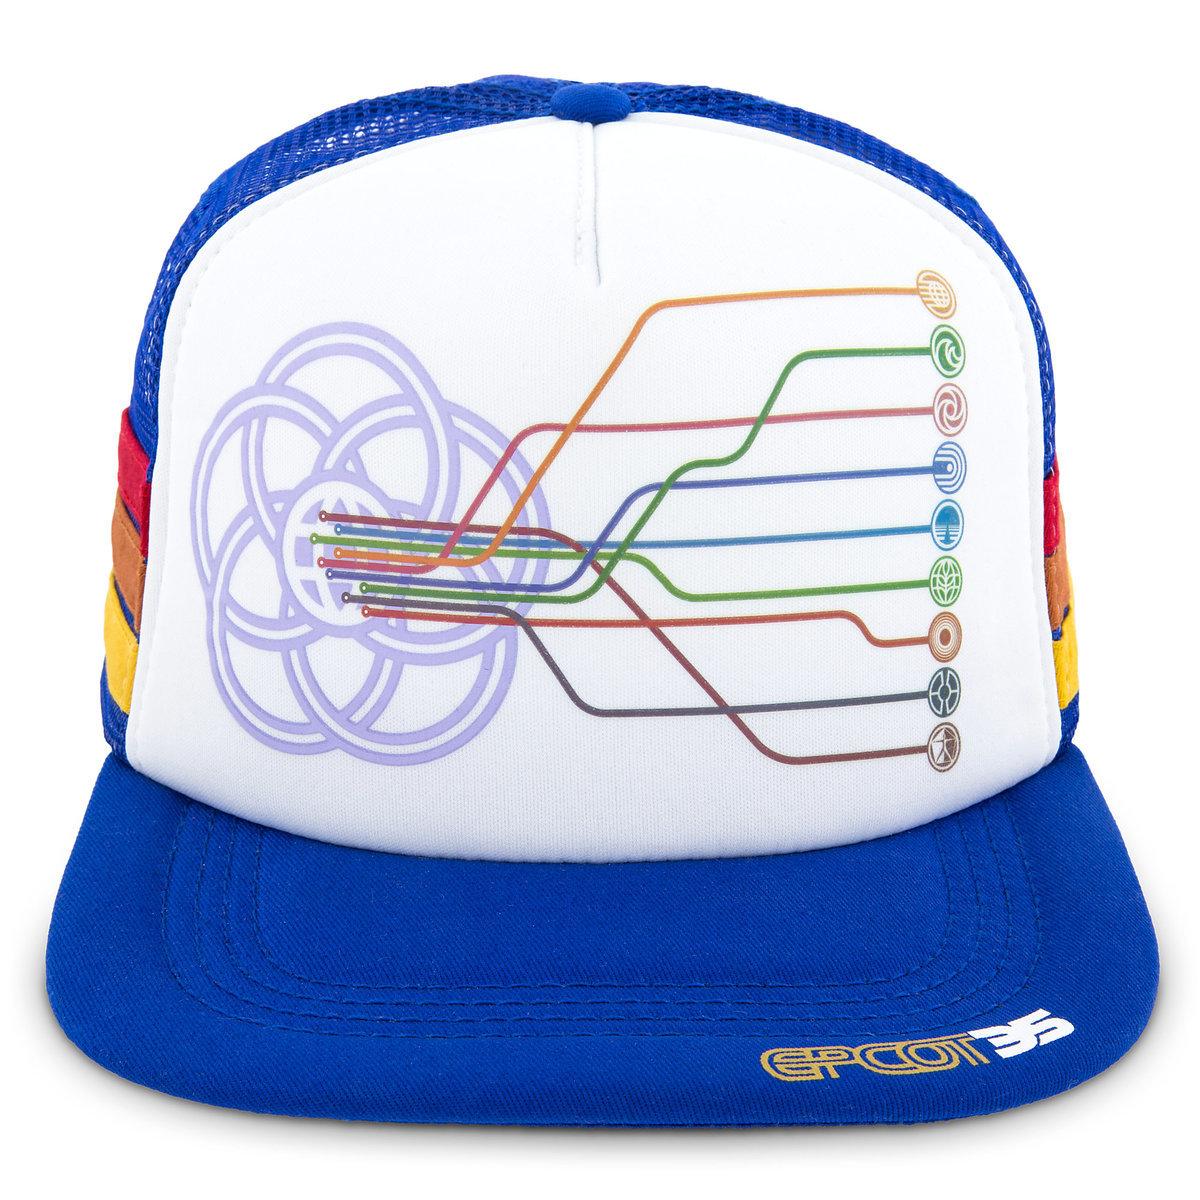 Disney Baseball Cap - Epcot 35th Anniversary - Pavilion Icons ffd92935fc6a